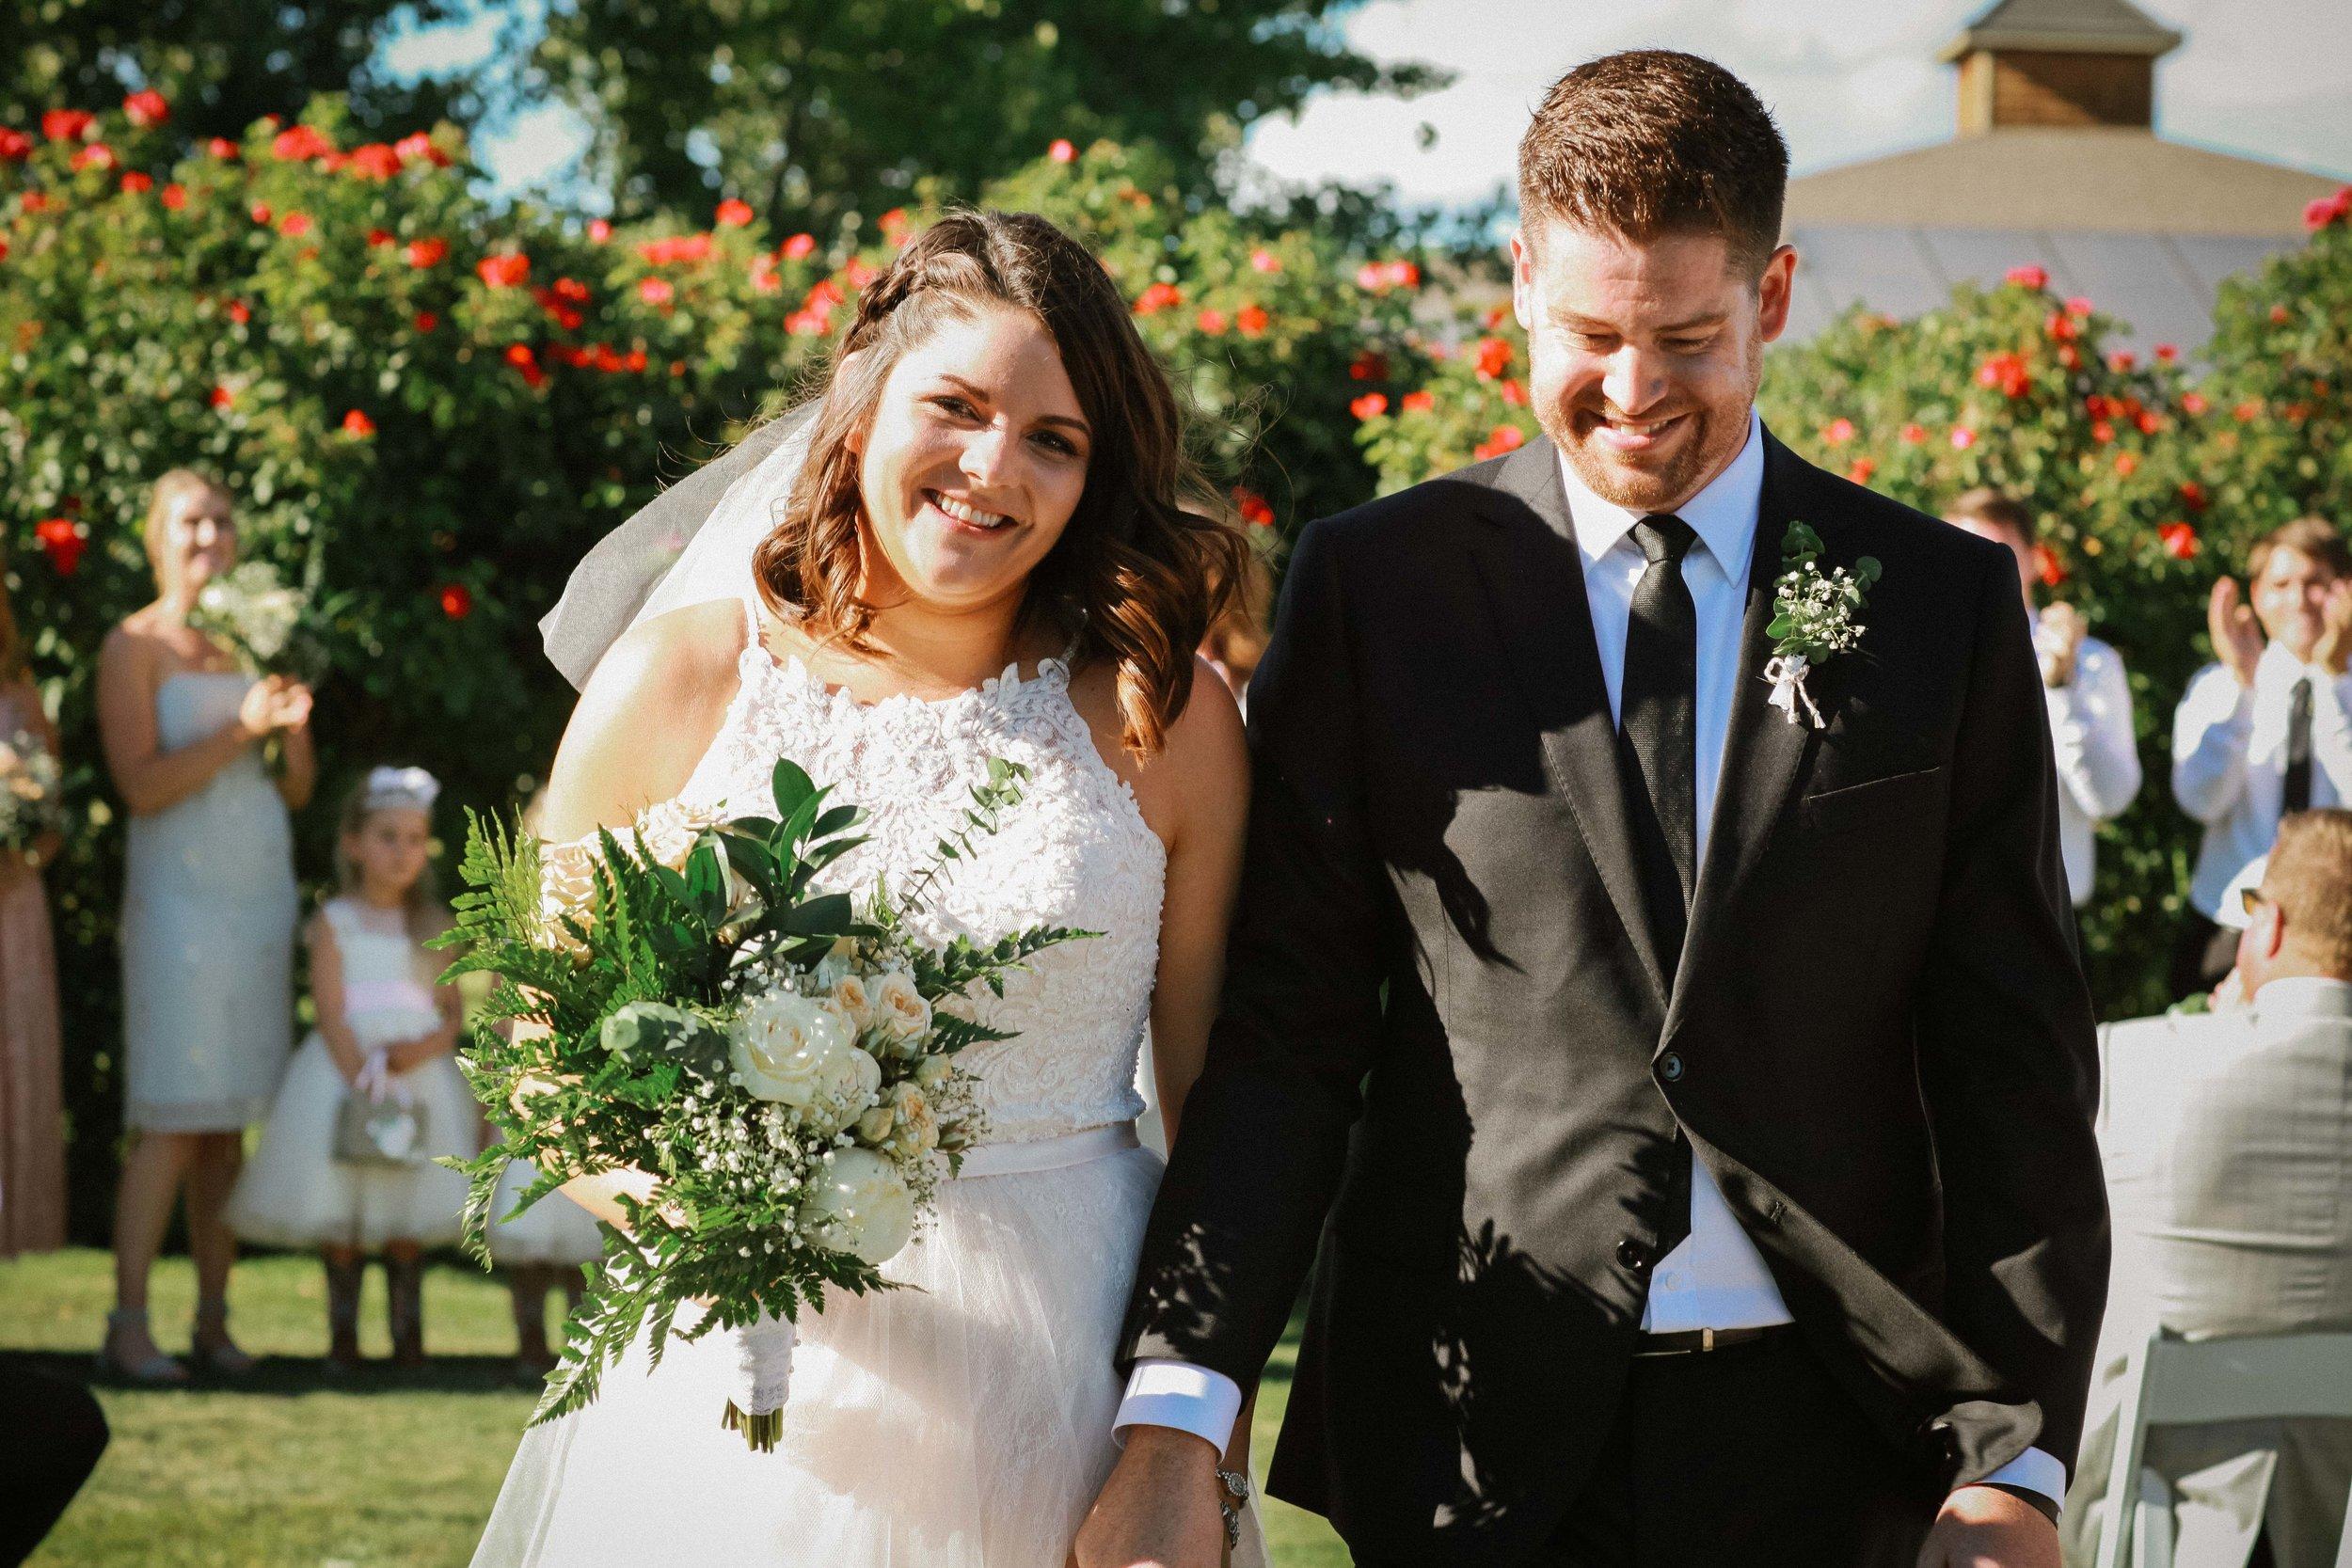 Rachel&Chase-Sneak Peek-41.jpg